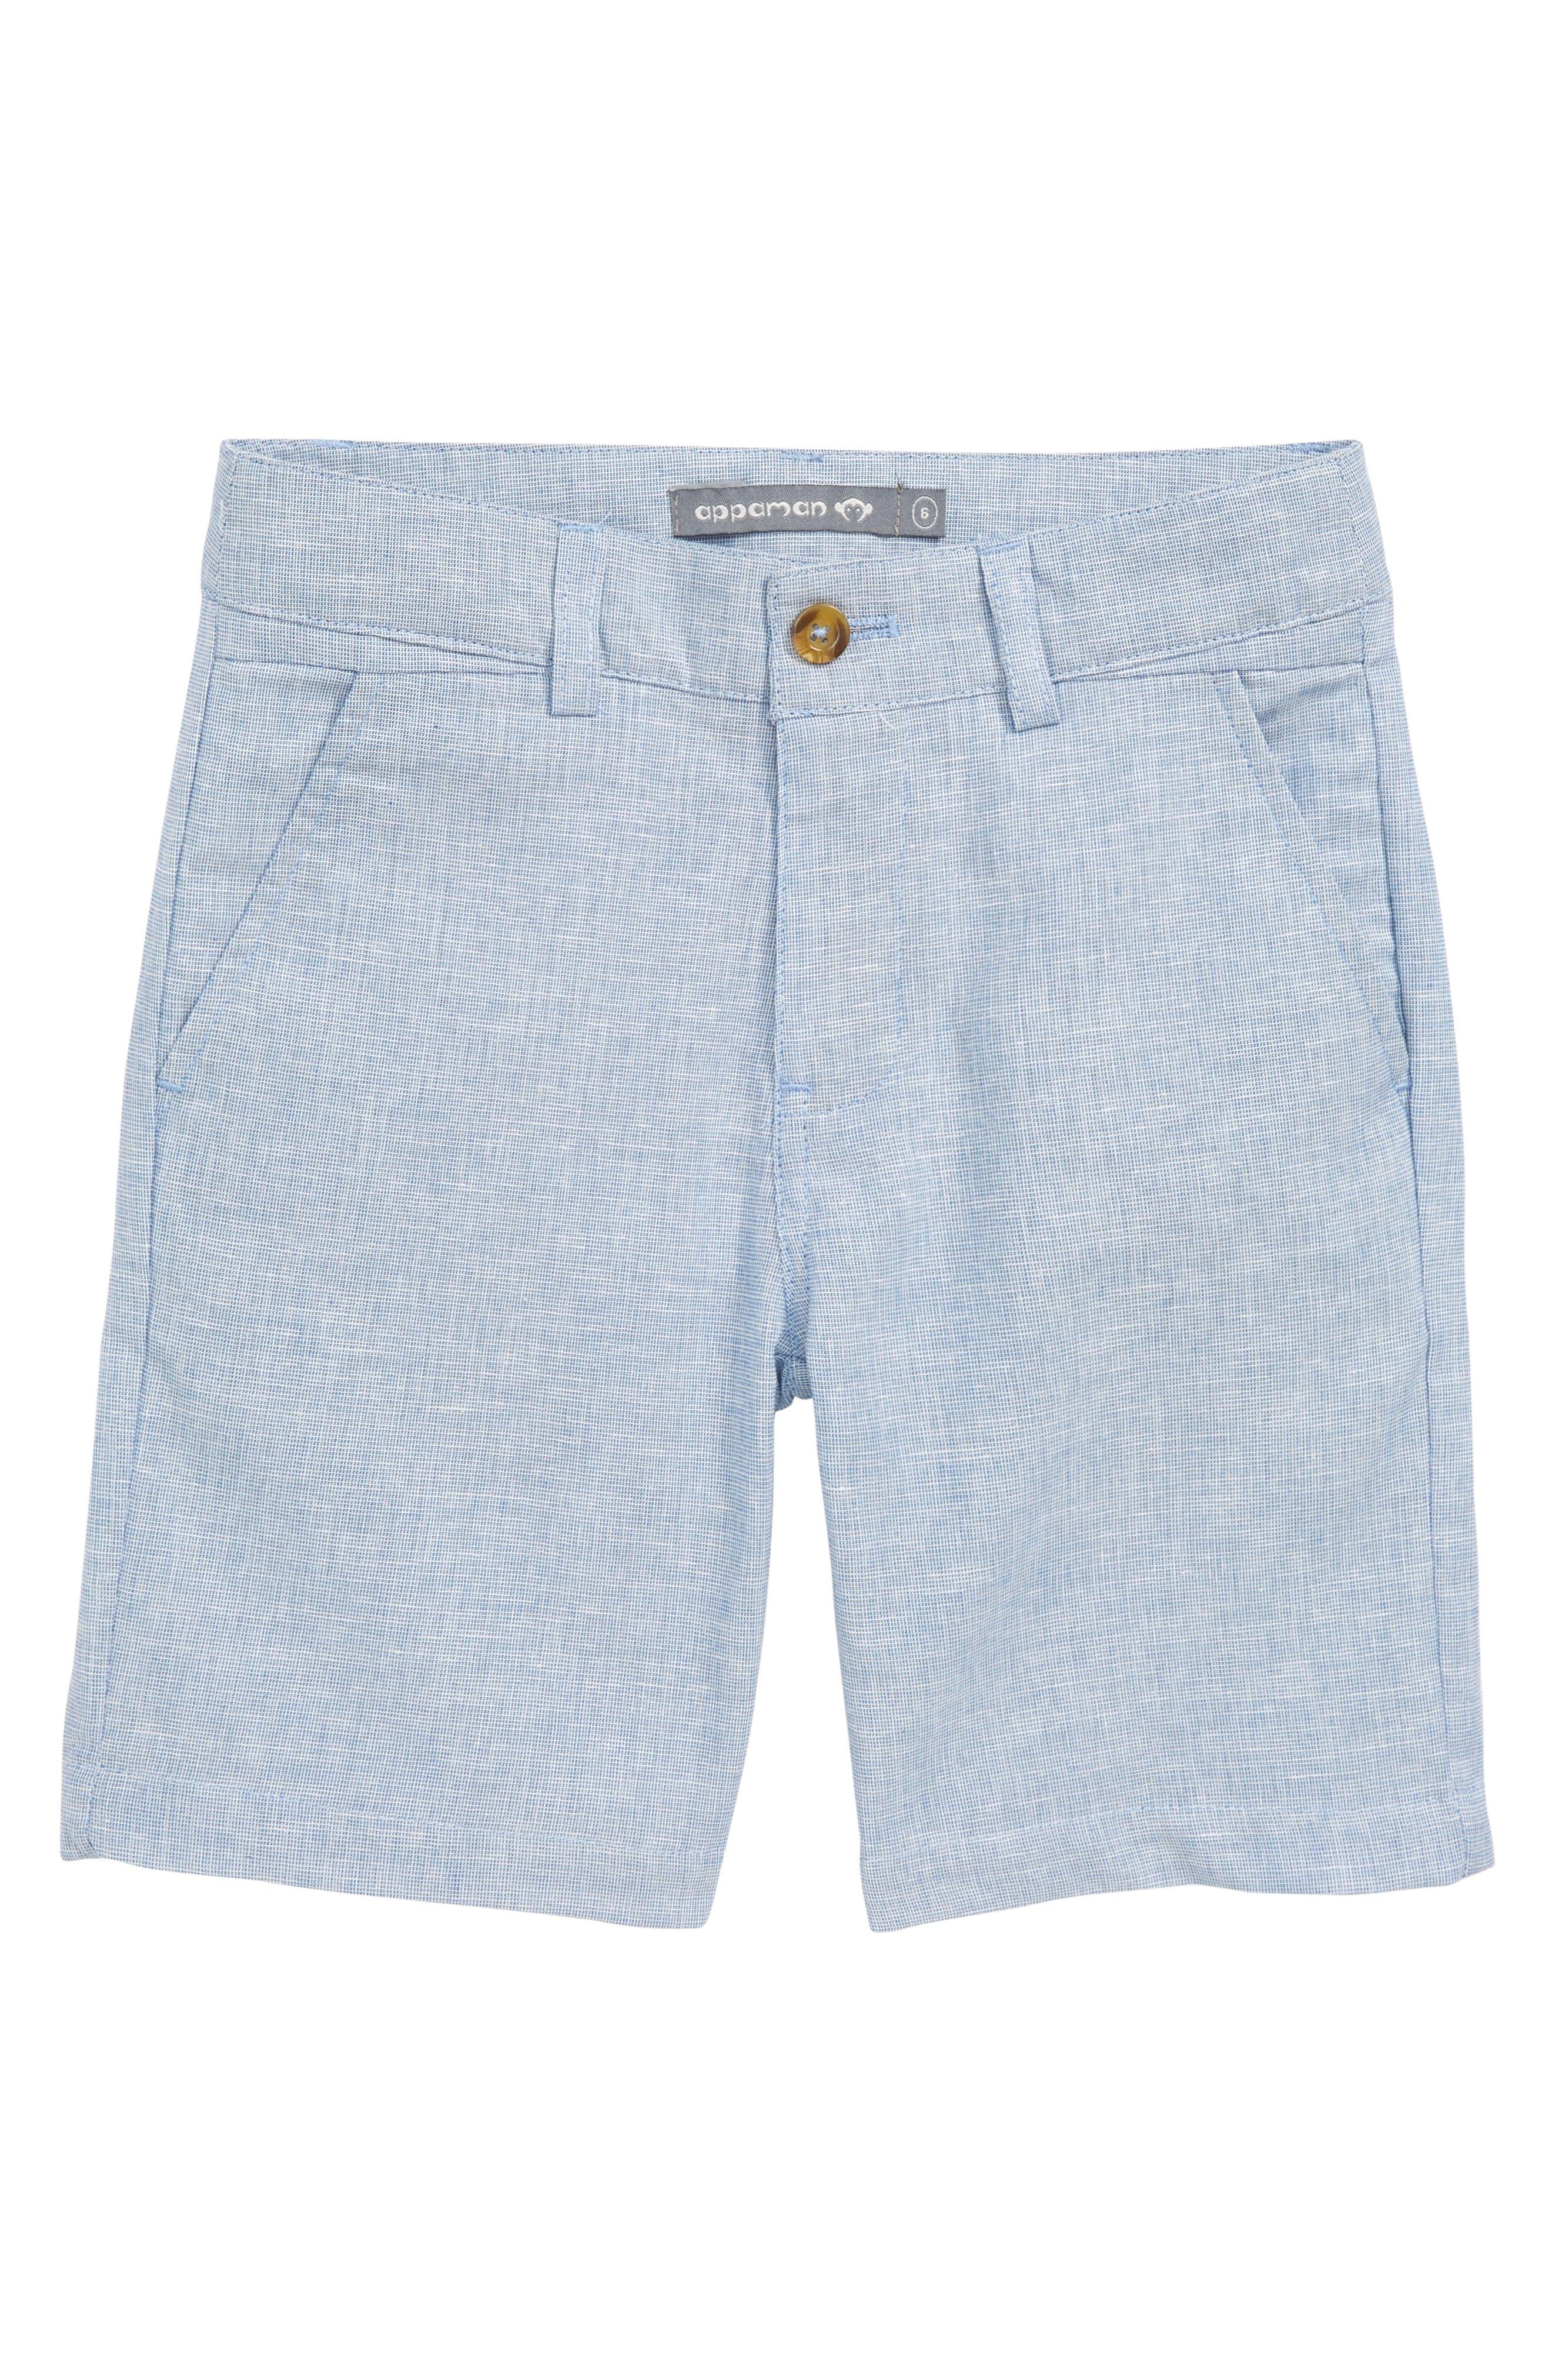 Trouser Shorts,                             Main thumbnail 1, color,                             459